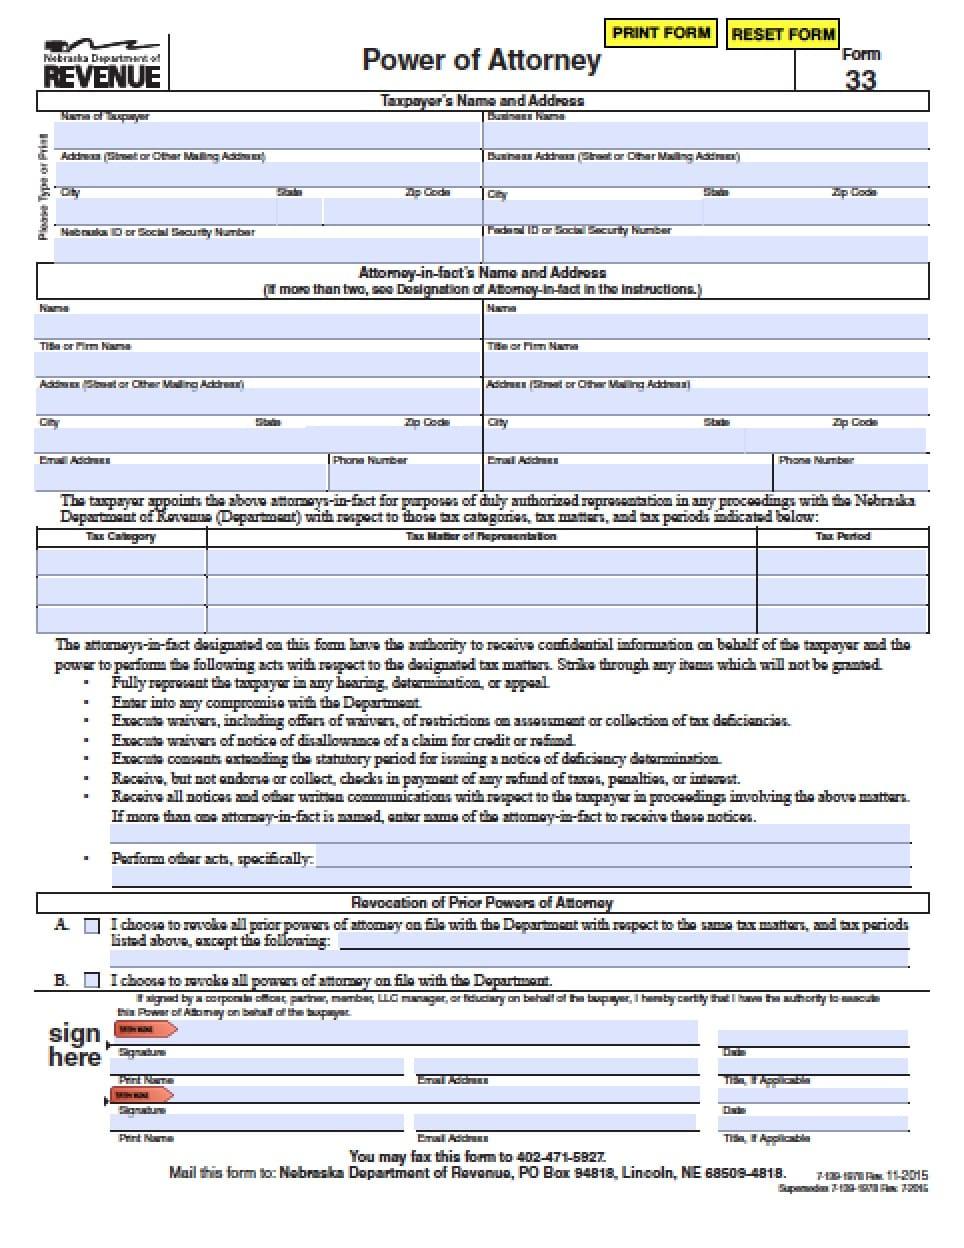 Nebraska Tax Power of Attorney Form - Power of Attorney : Power of ...